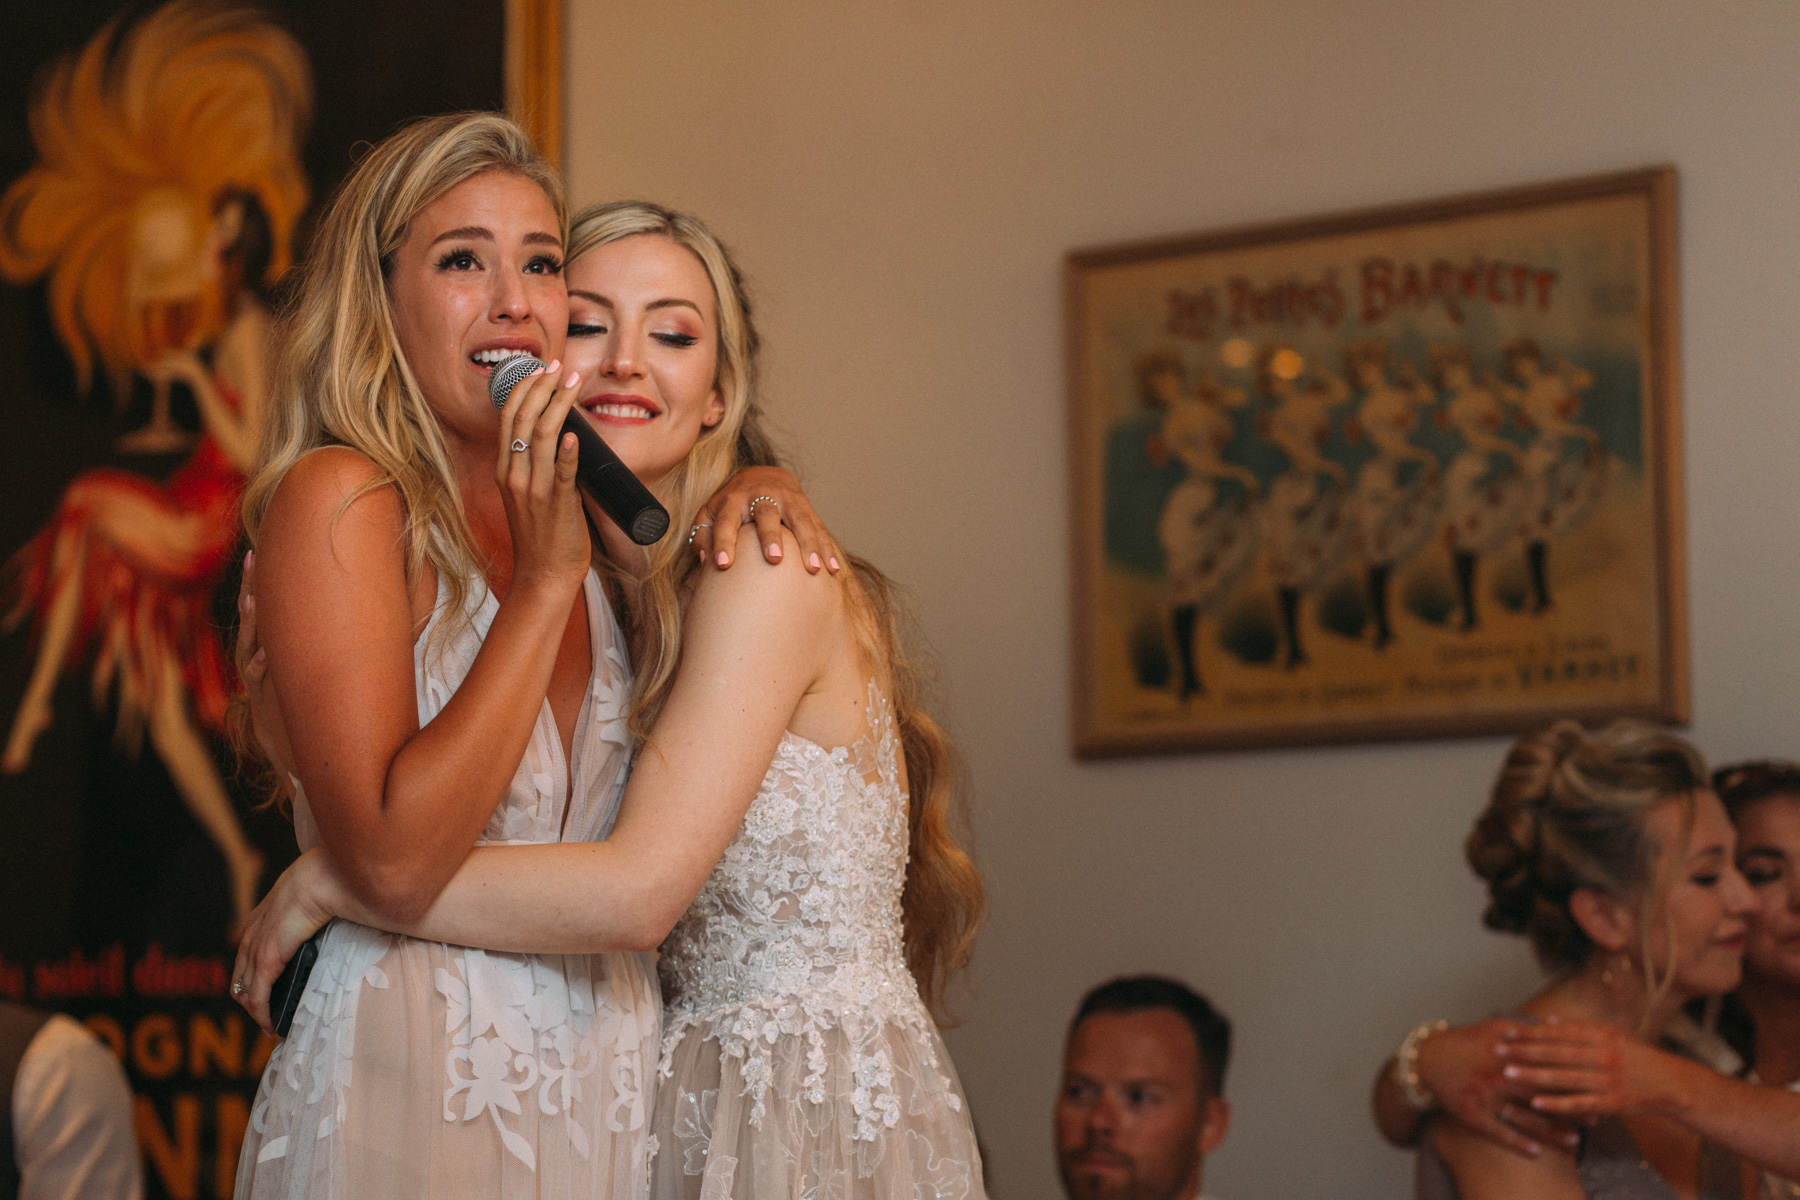 La-Maquette-wedding-by-Toronto-modern-wedding-photographer-Sam-Wong_39.jpg